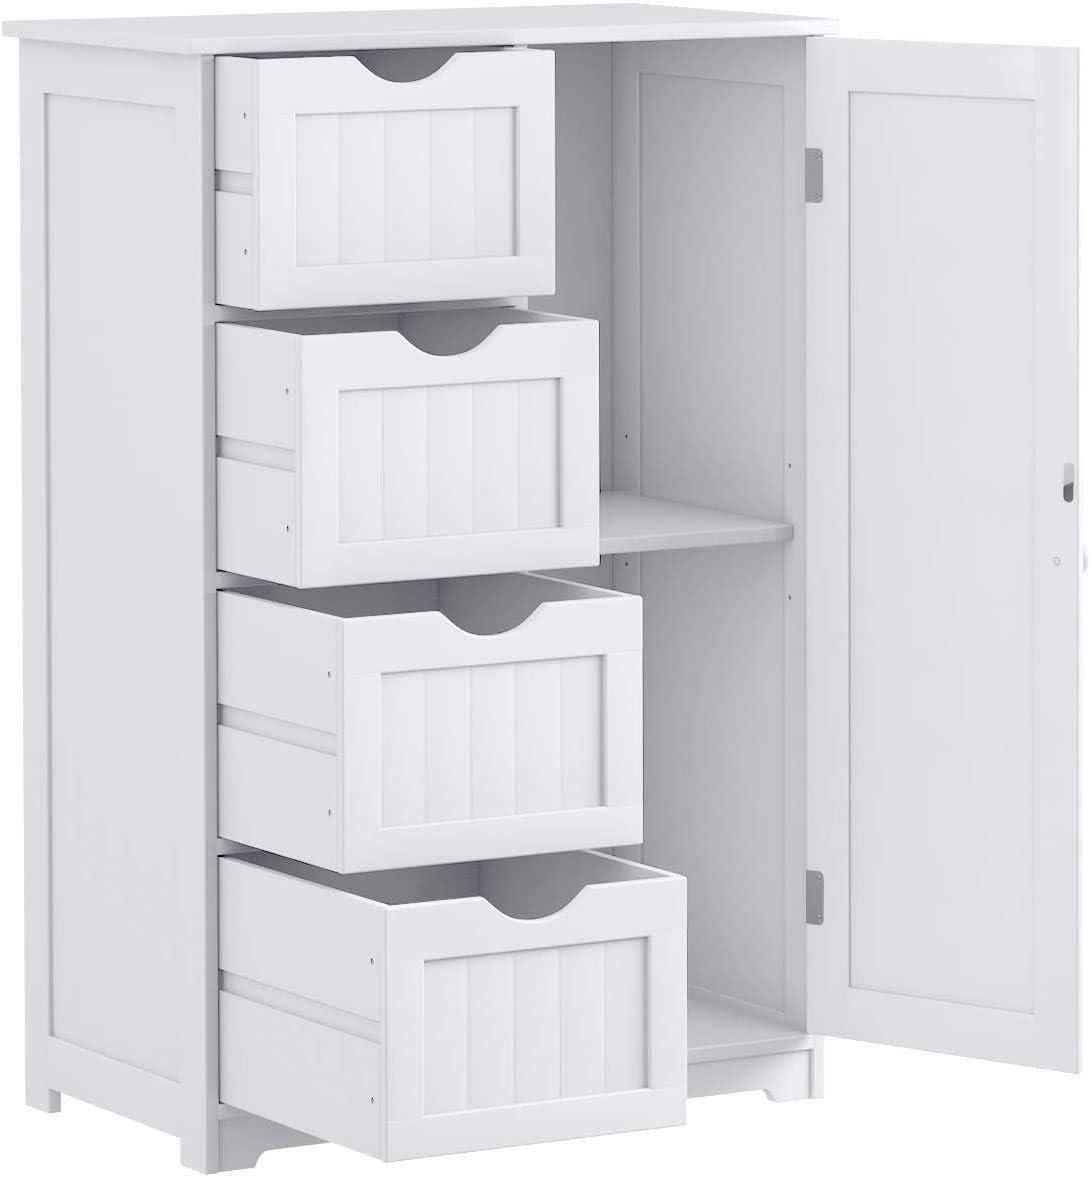 Nightcore Floor Storage Cabinet, Bathroom Floor Storage Cabinets